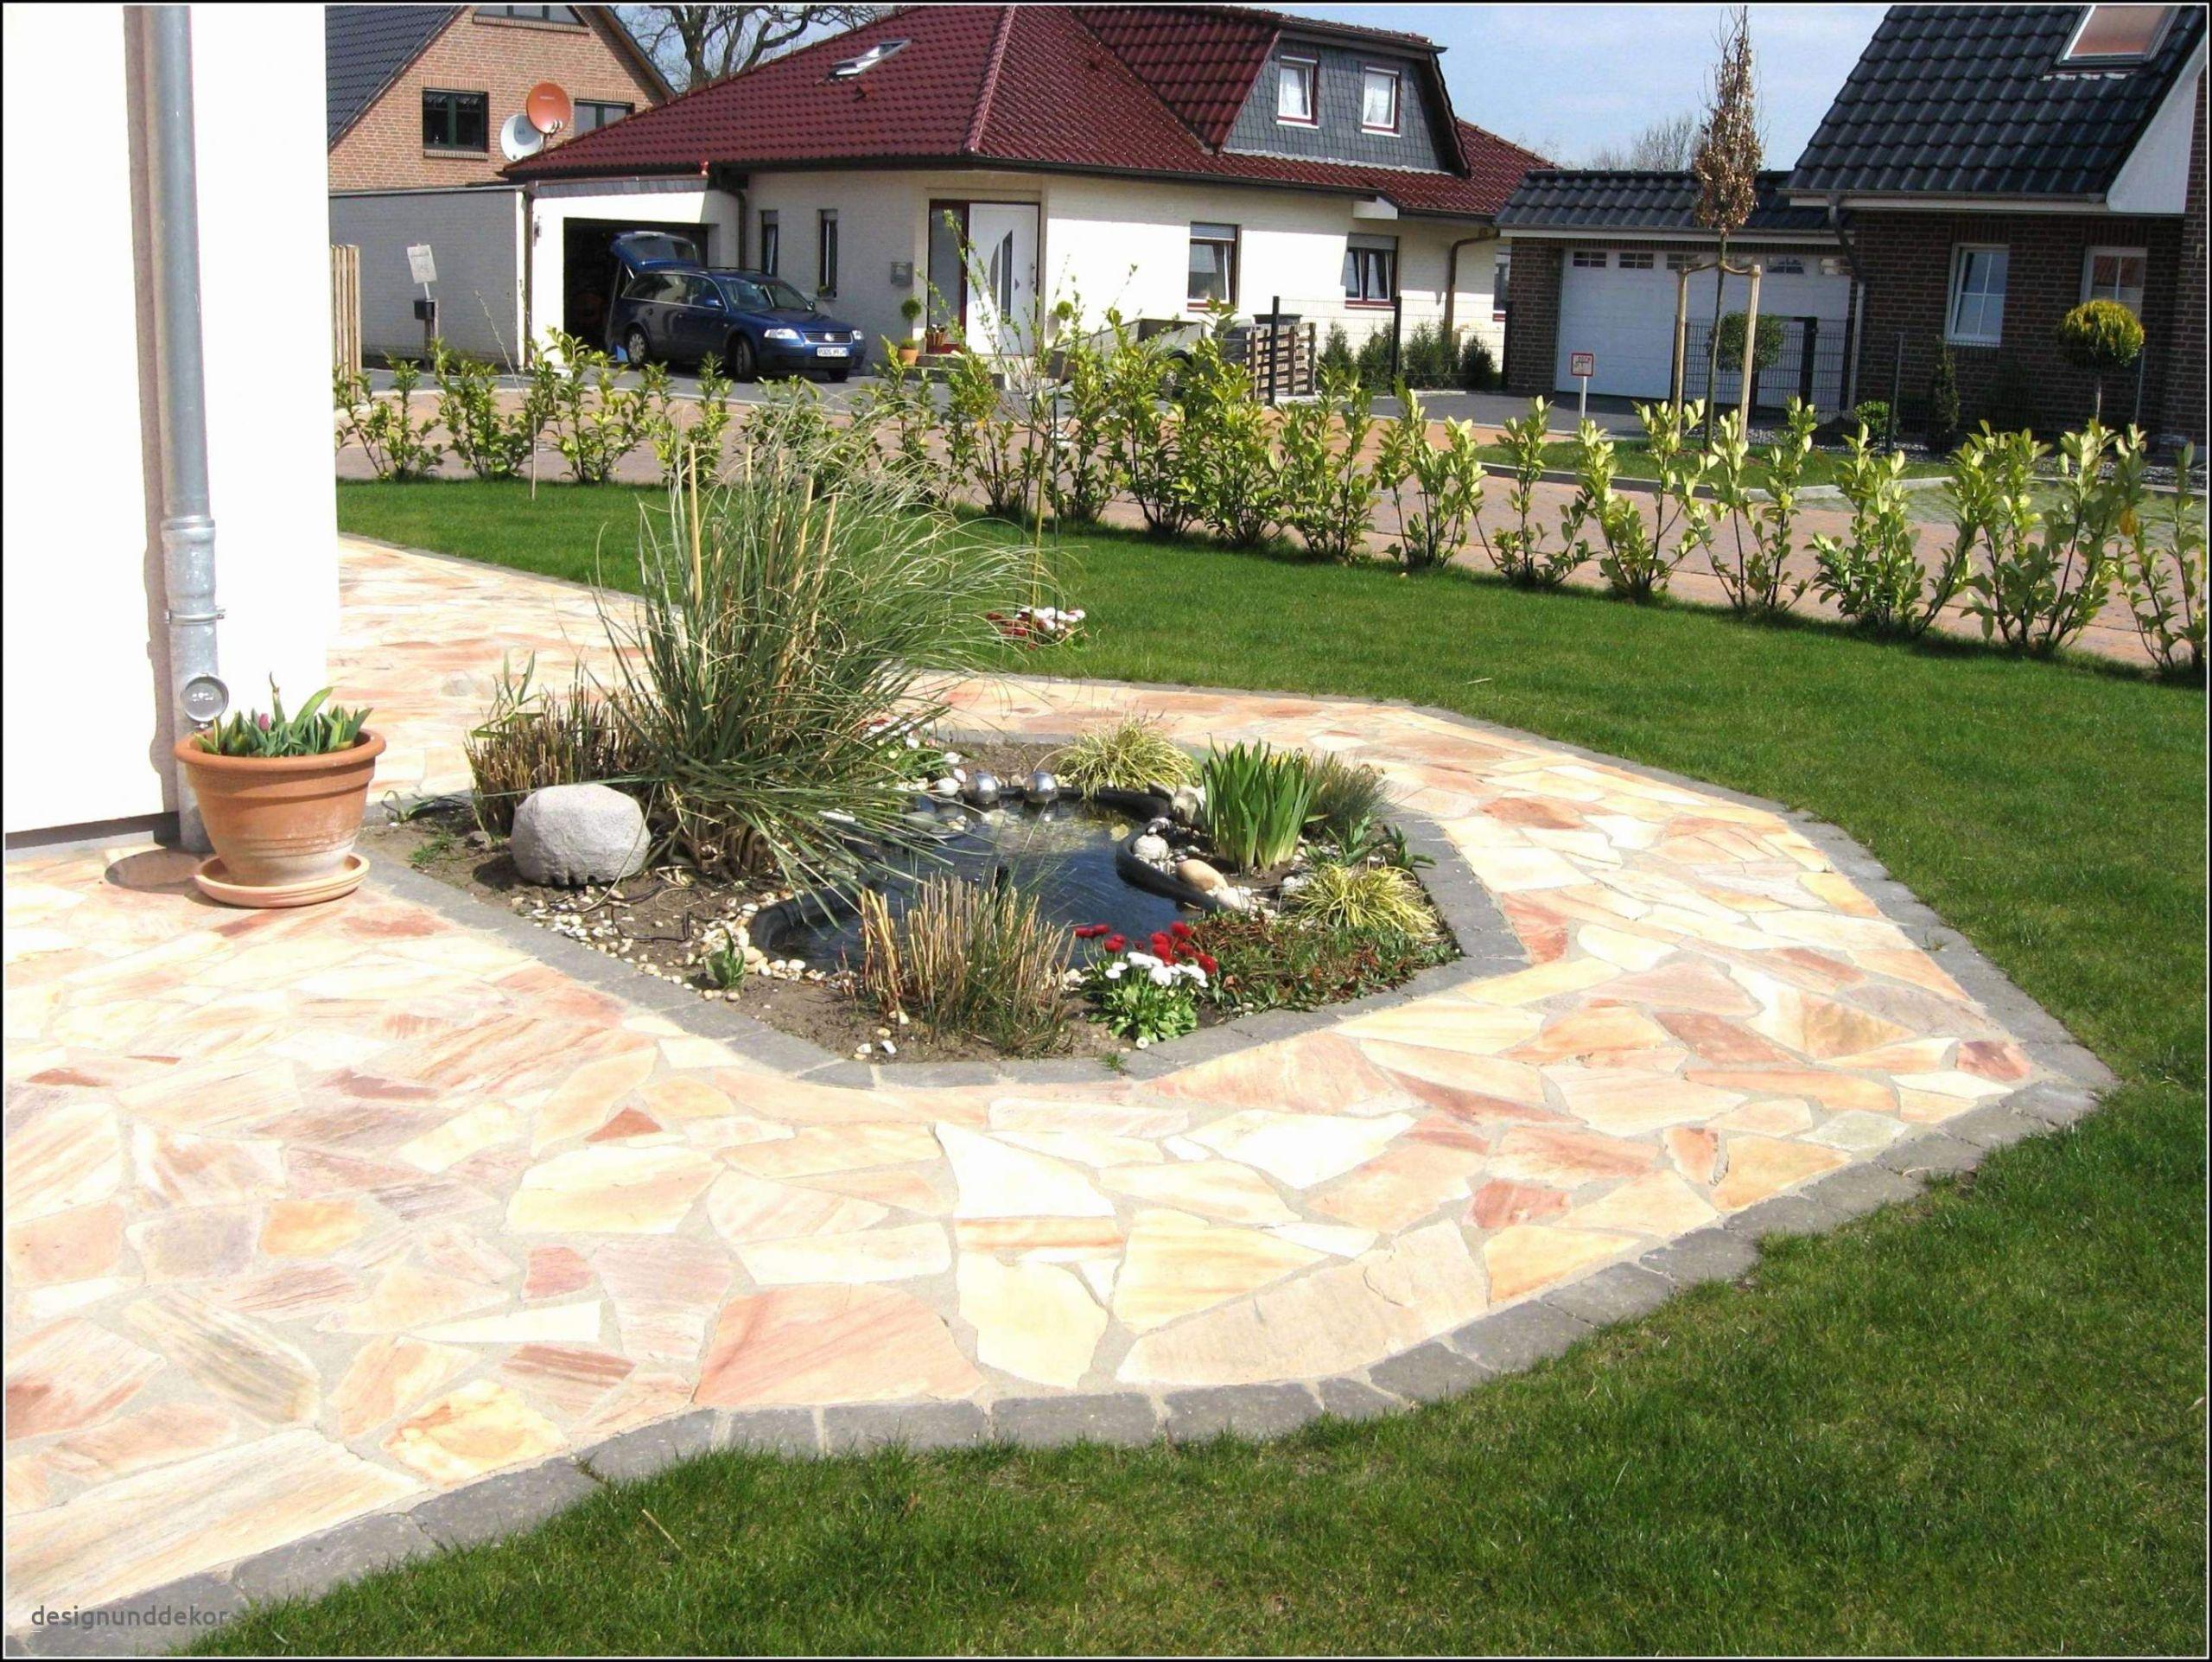 Garten Anlegen Modern Luxus Kleinen Vorgarten Gestalten Temobardz Home Blog Garten Anlegen